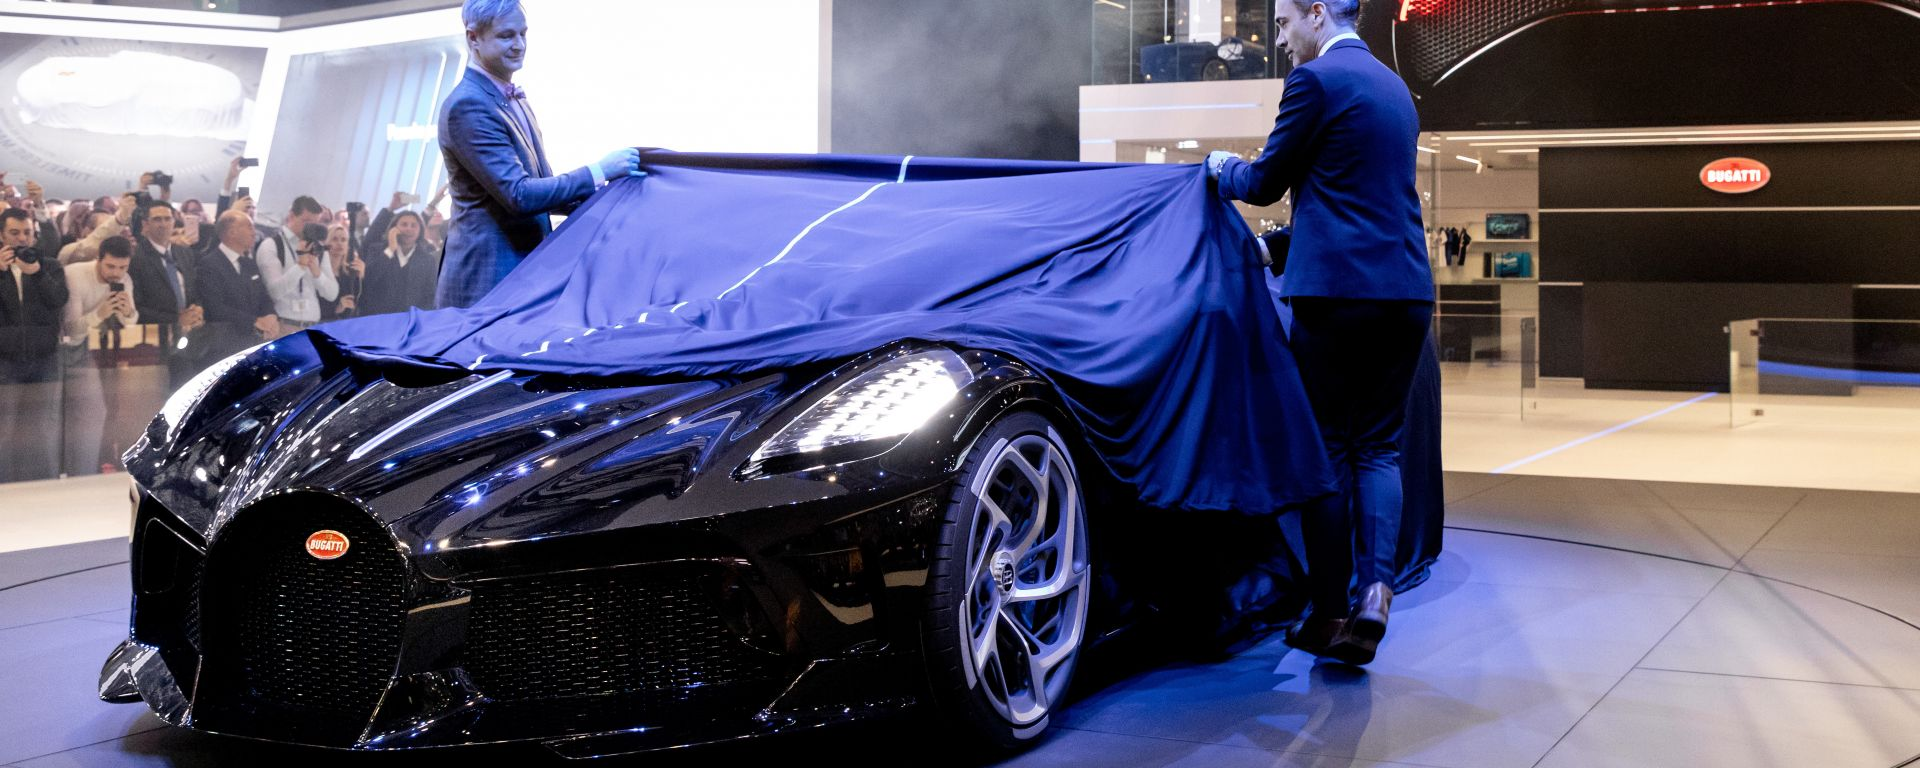 Bugatti Voiture Noire, Ginevra 2019